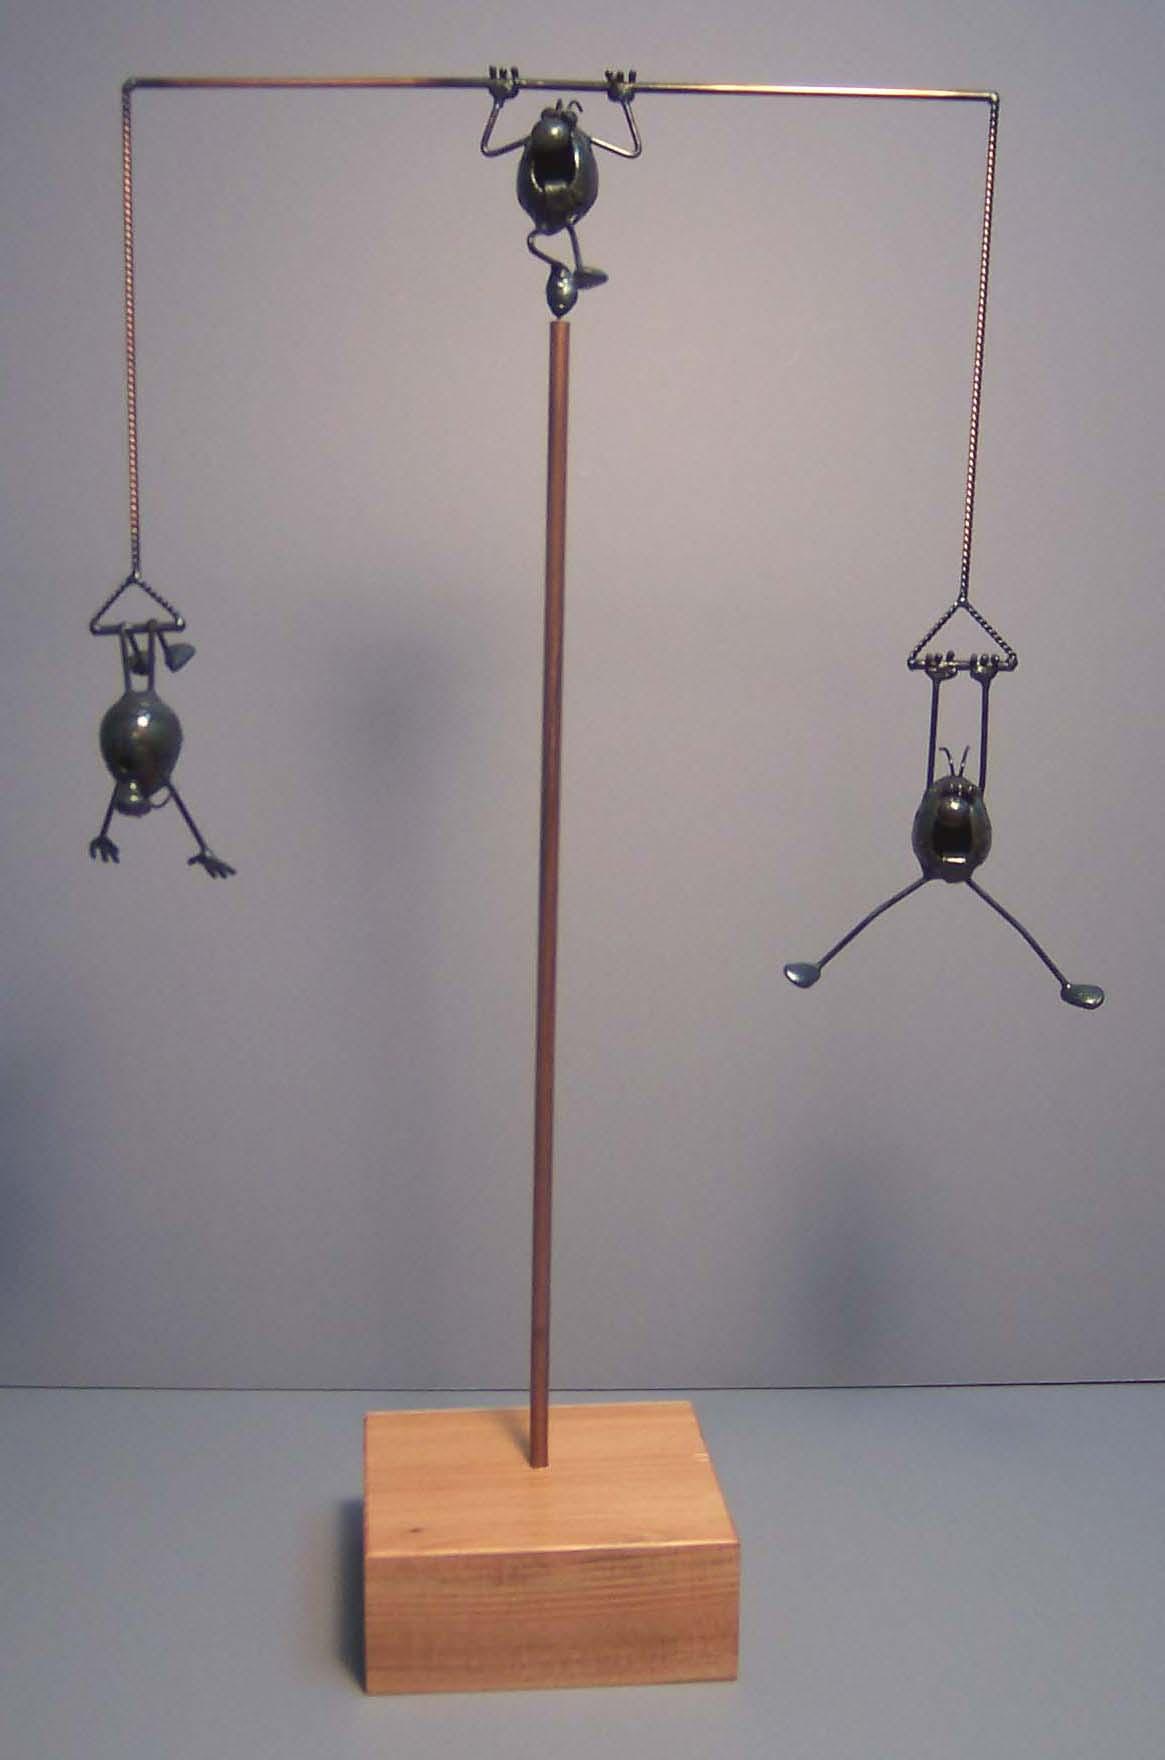 Balancing scene, 3 flea